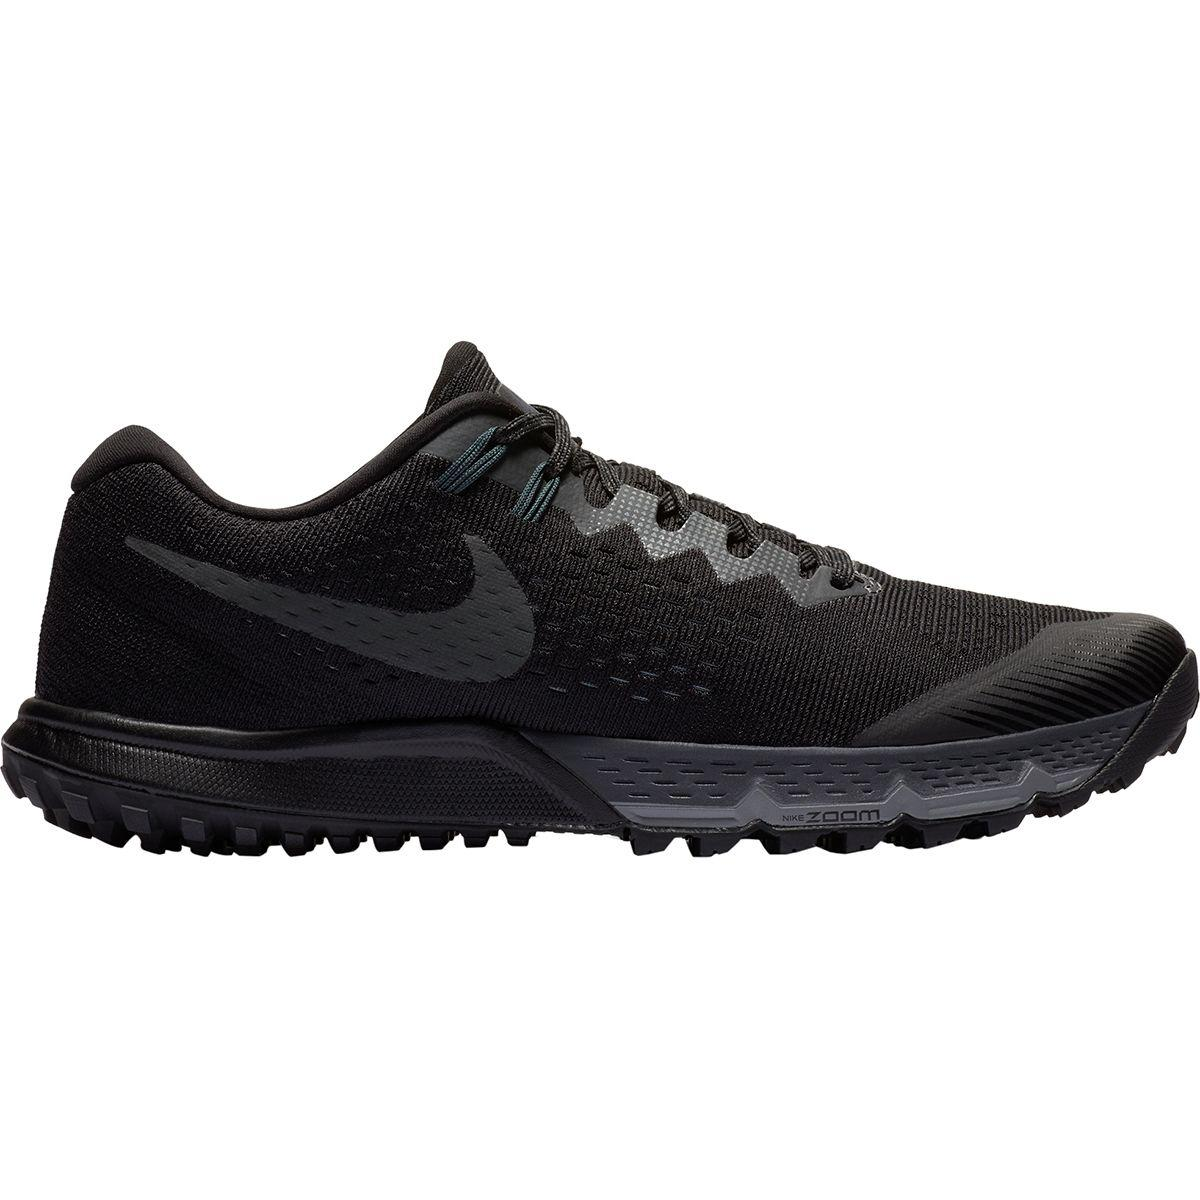 f10b8b52492b Lyst - Nike Air Zoom Terra Kiger 4 Trail Running Shoe in Black for Men